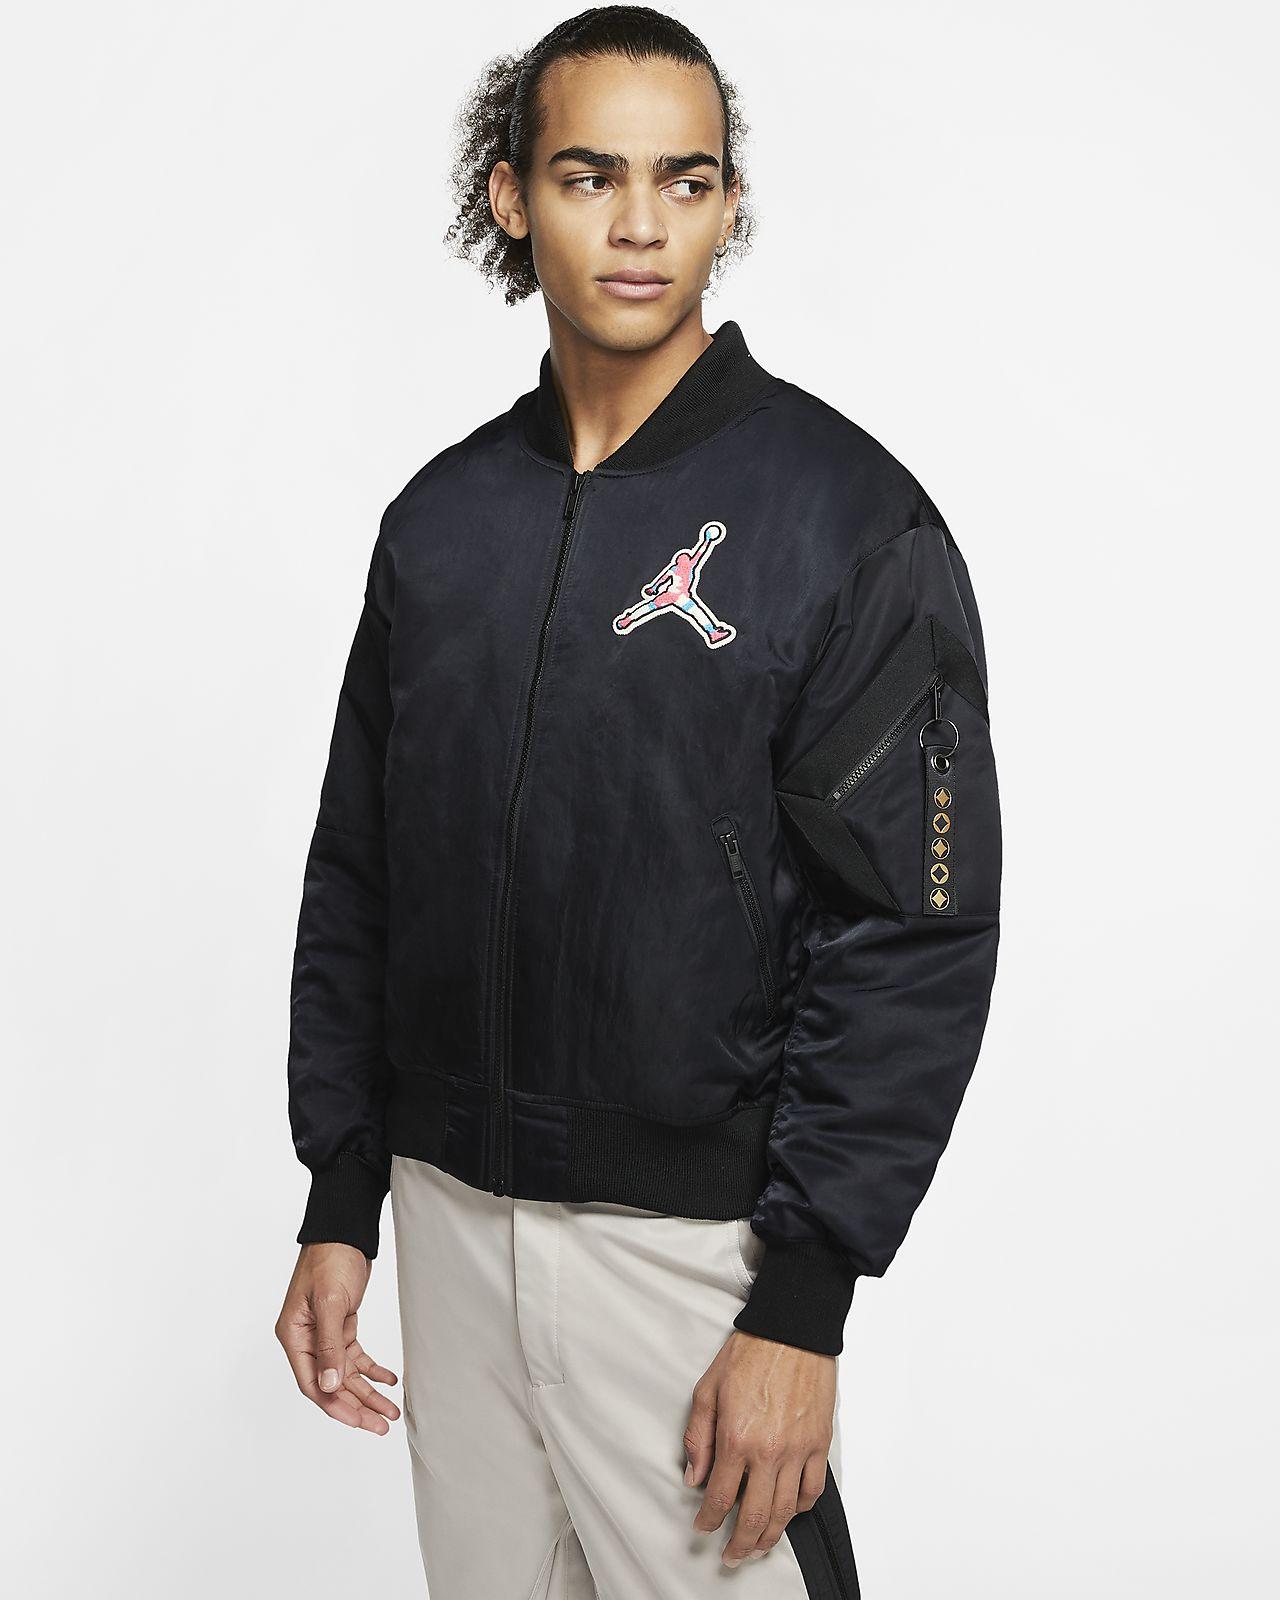 jordan jacket bomber factory store